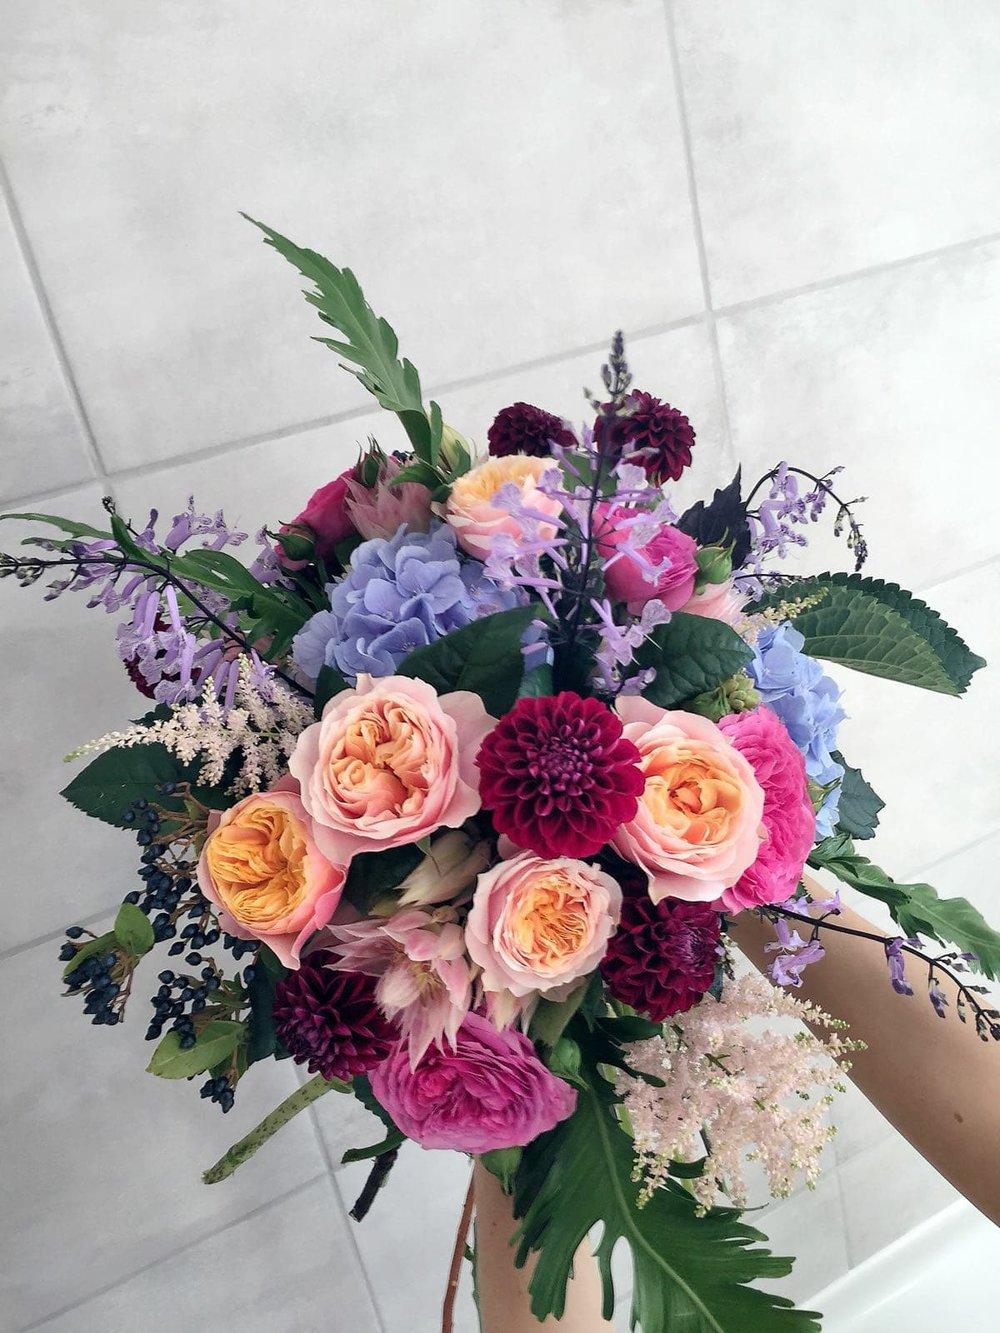 bespoke bouquet order sula bailie london florist gift